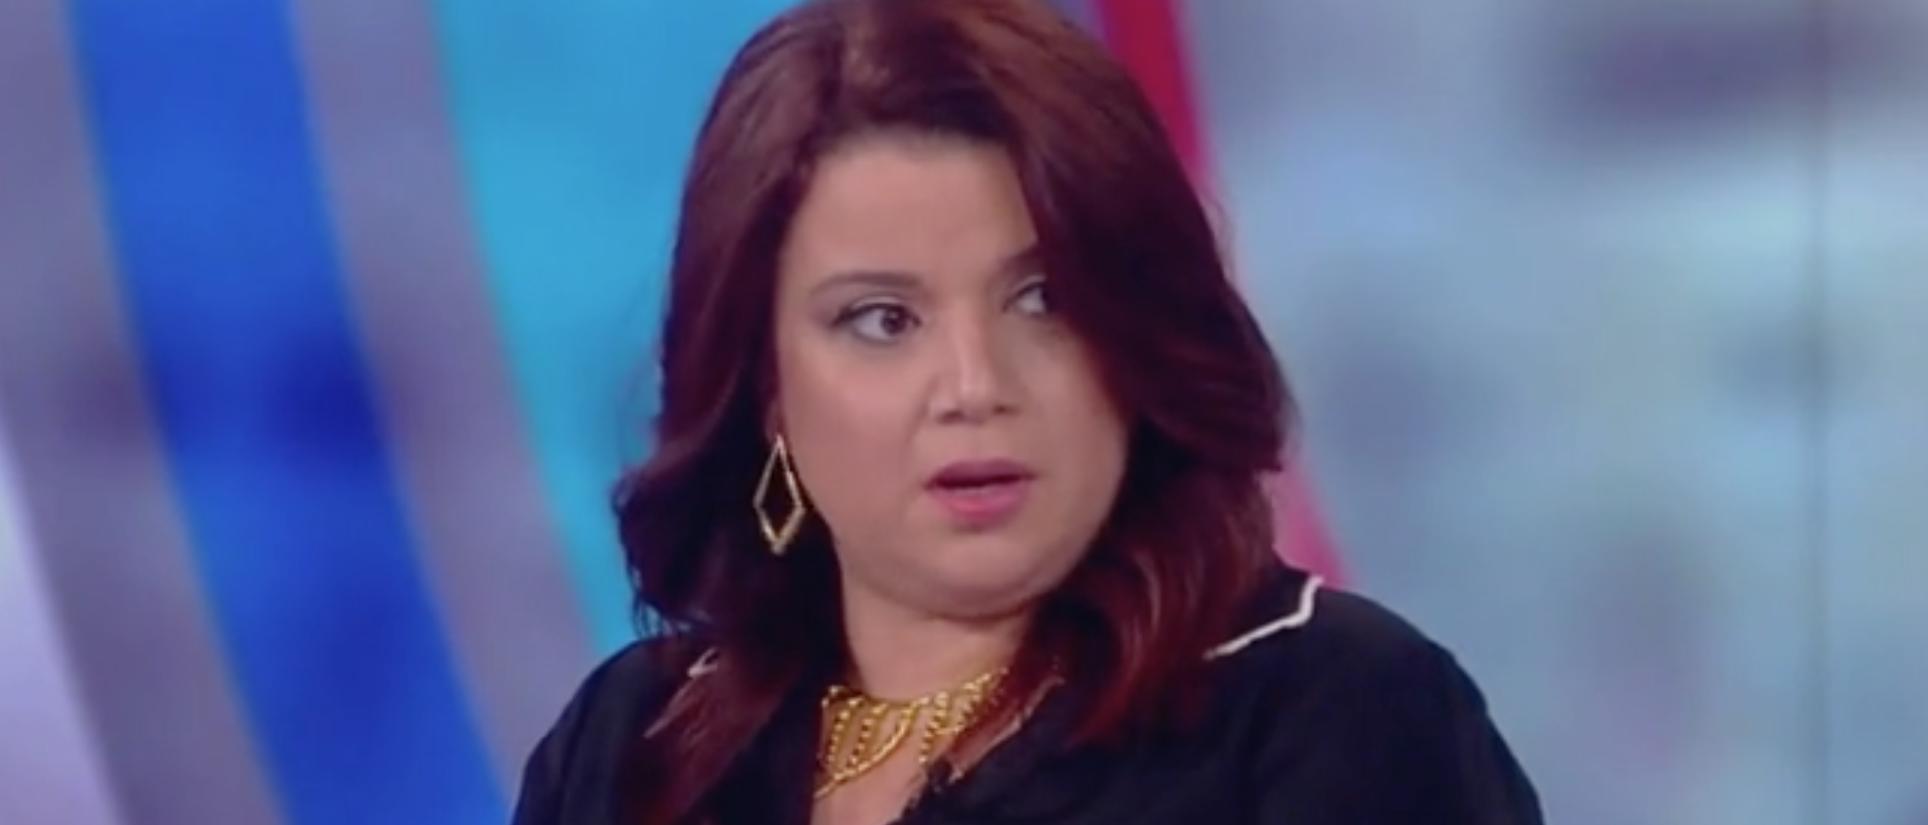 Ana Navarro Blows Up At Meghan McCain: 'Don't Scream At Me. I'm Two Feet Away'